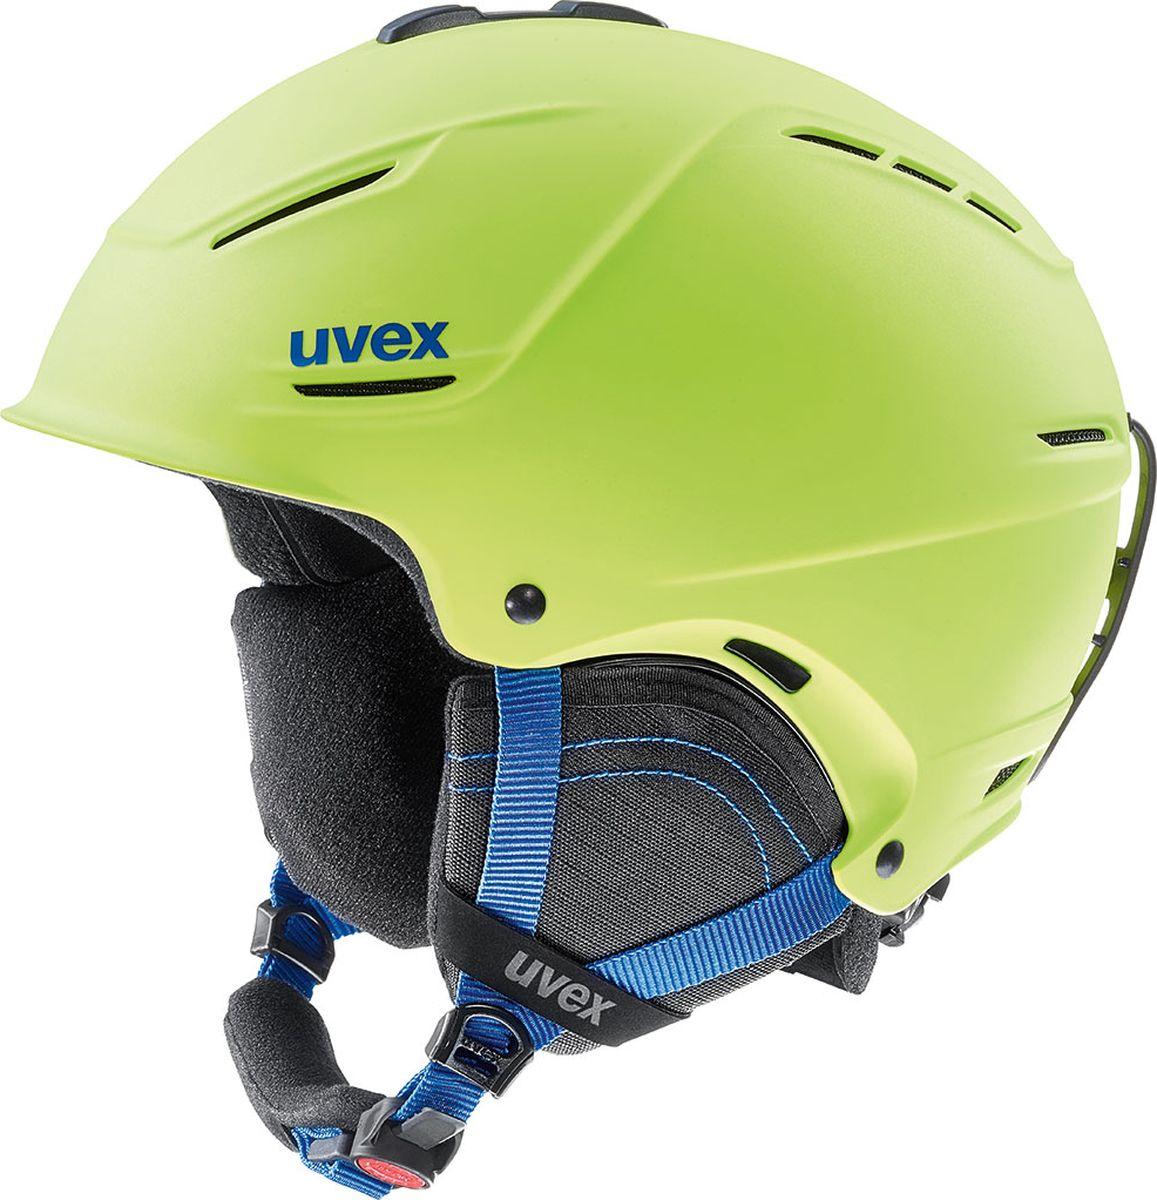 "Шлем горнолыжный Uvex ""P1us 2.0 Helmet"", цвет: лайм матовый. Размер 55/59"